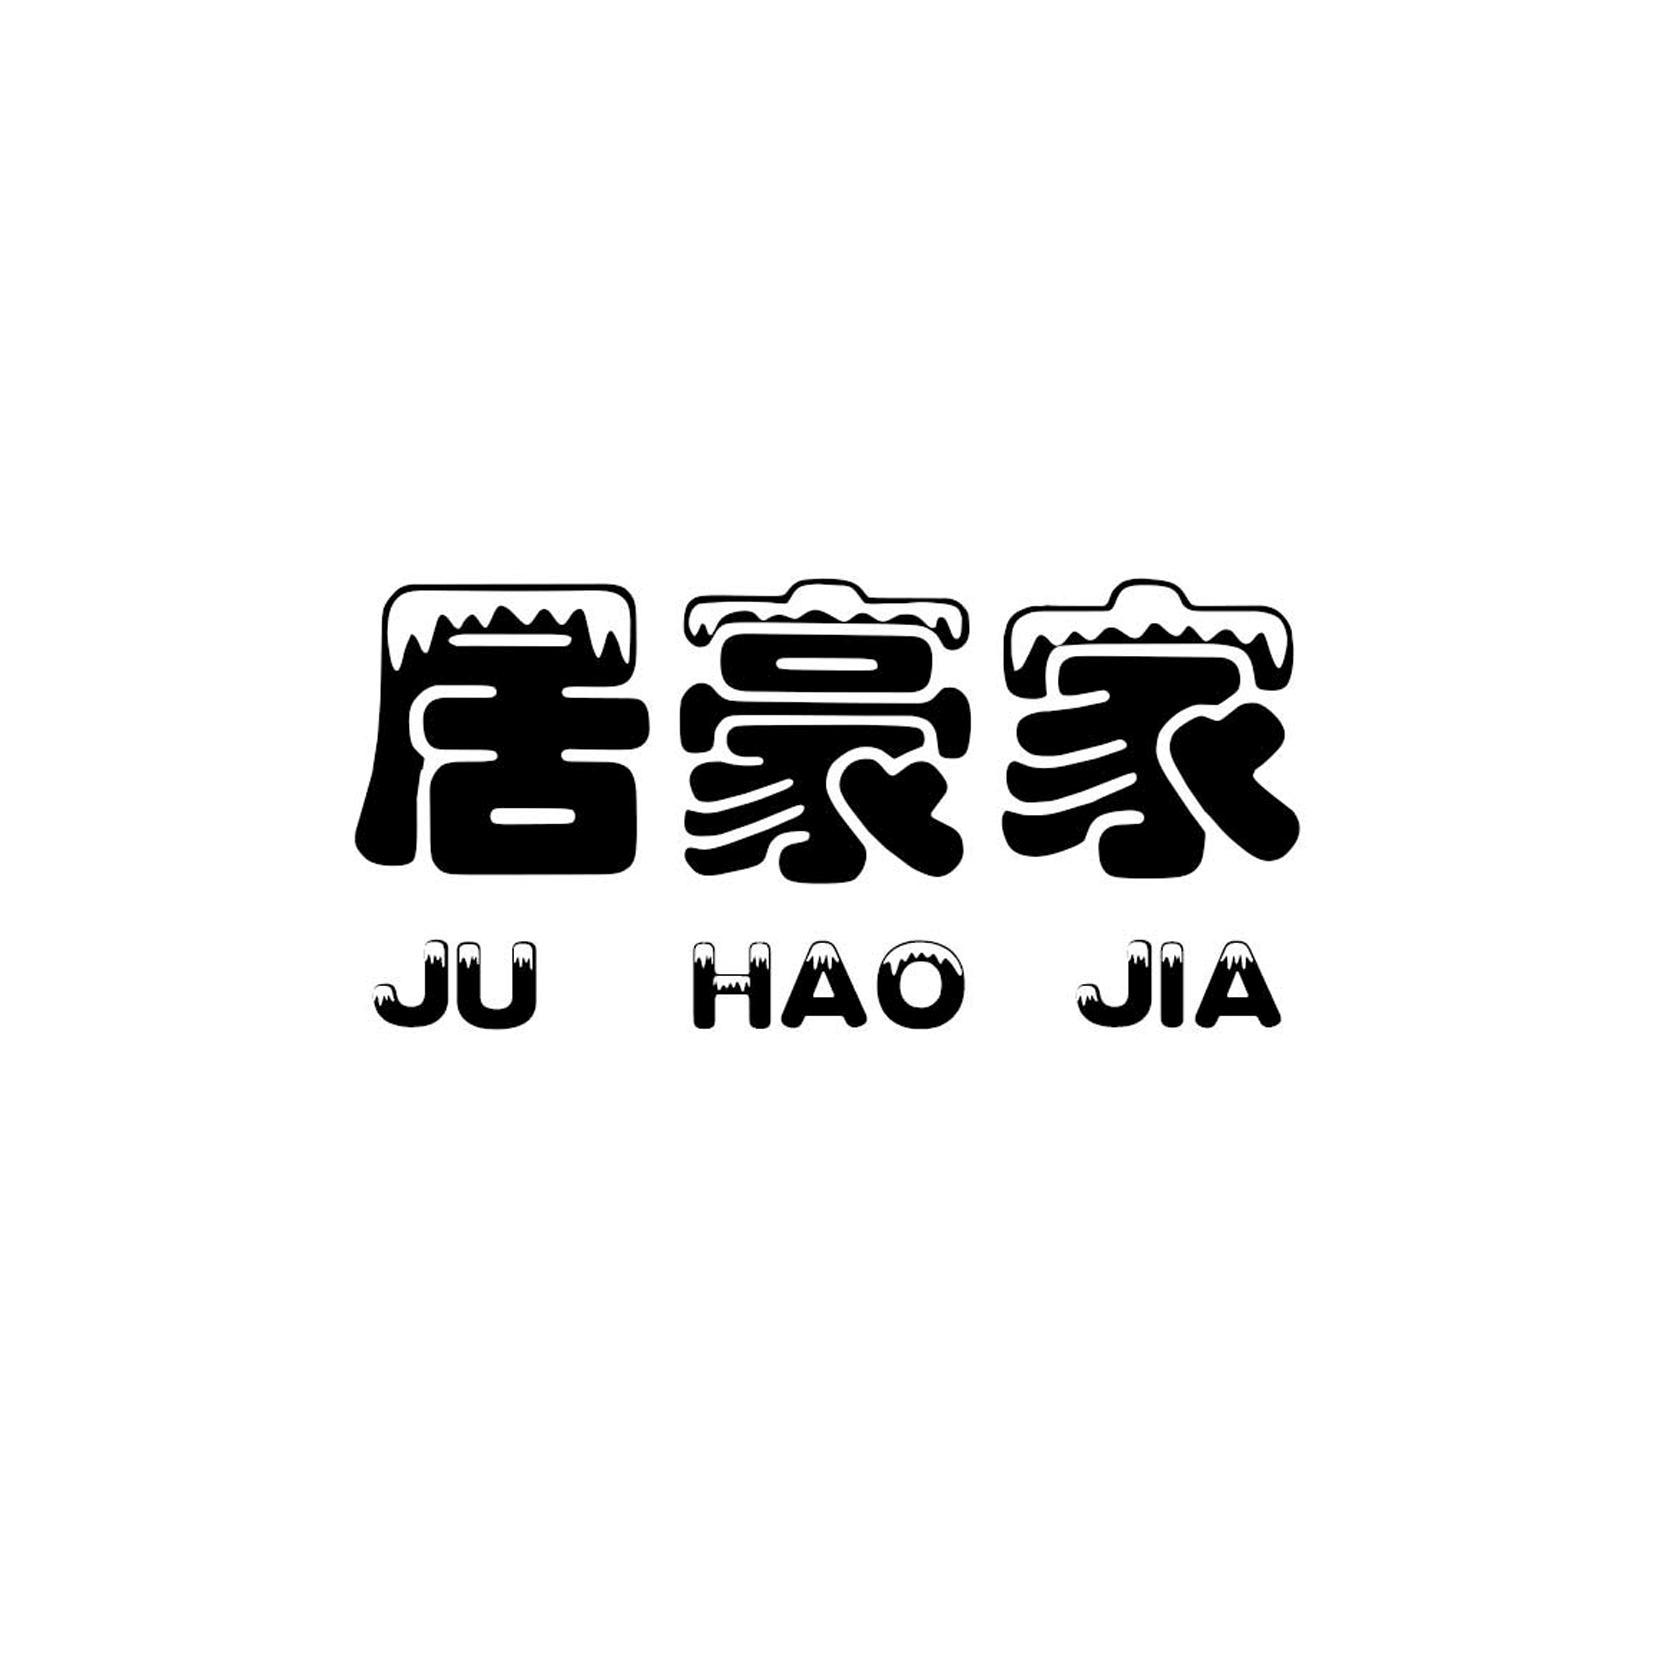 居豪家JUHAOJIA